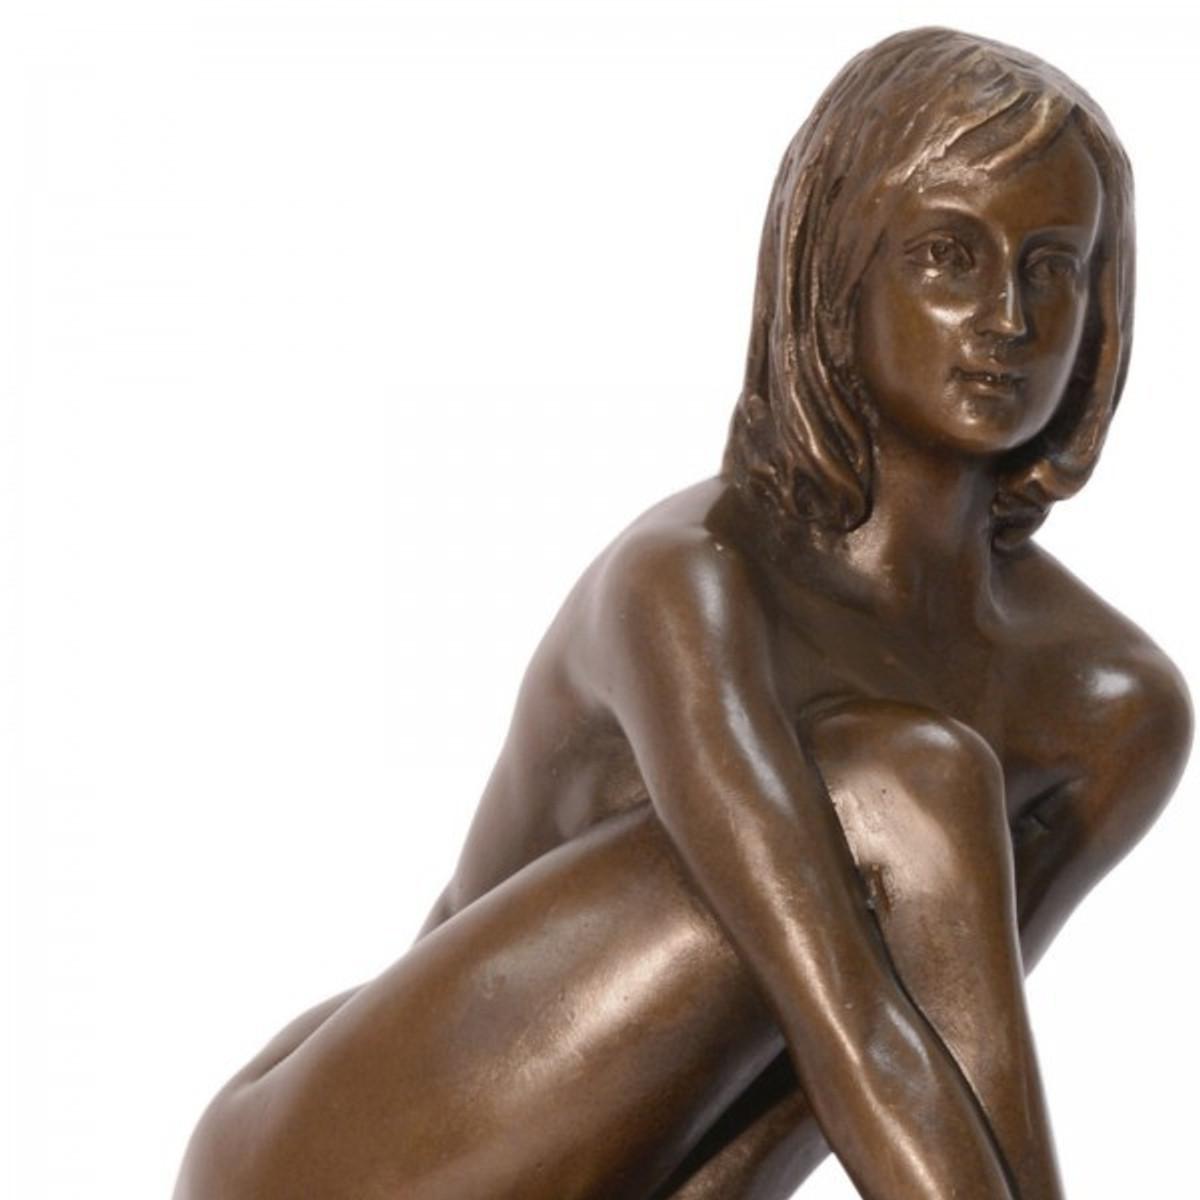 Junge Frau Bronze Skulptur als schlüpfrige Erotik Kunst mit Niveau im antik Stil.